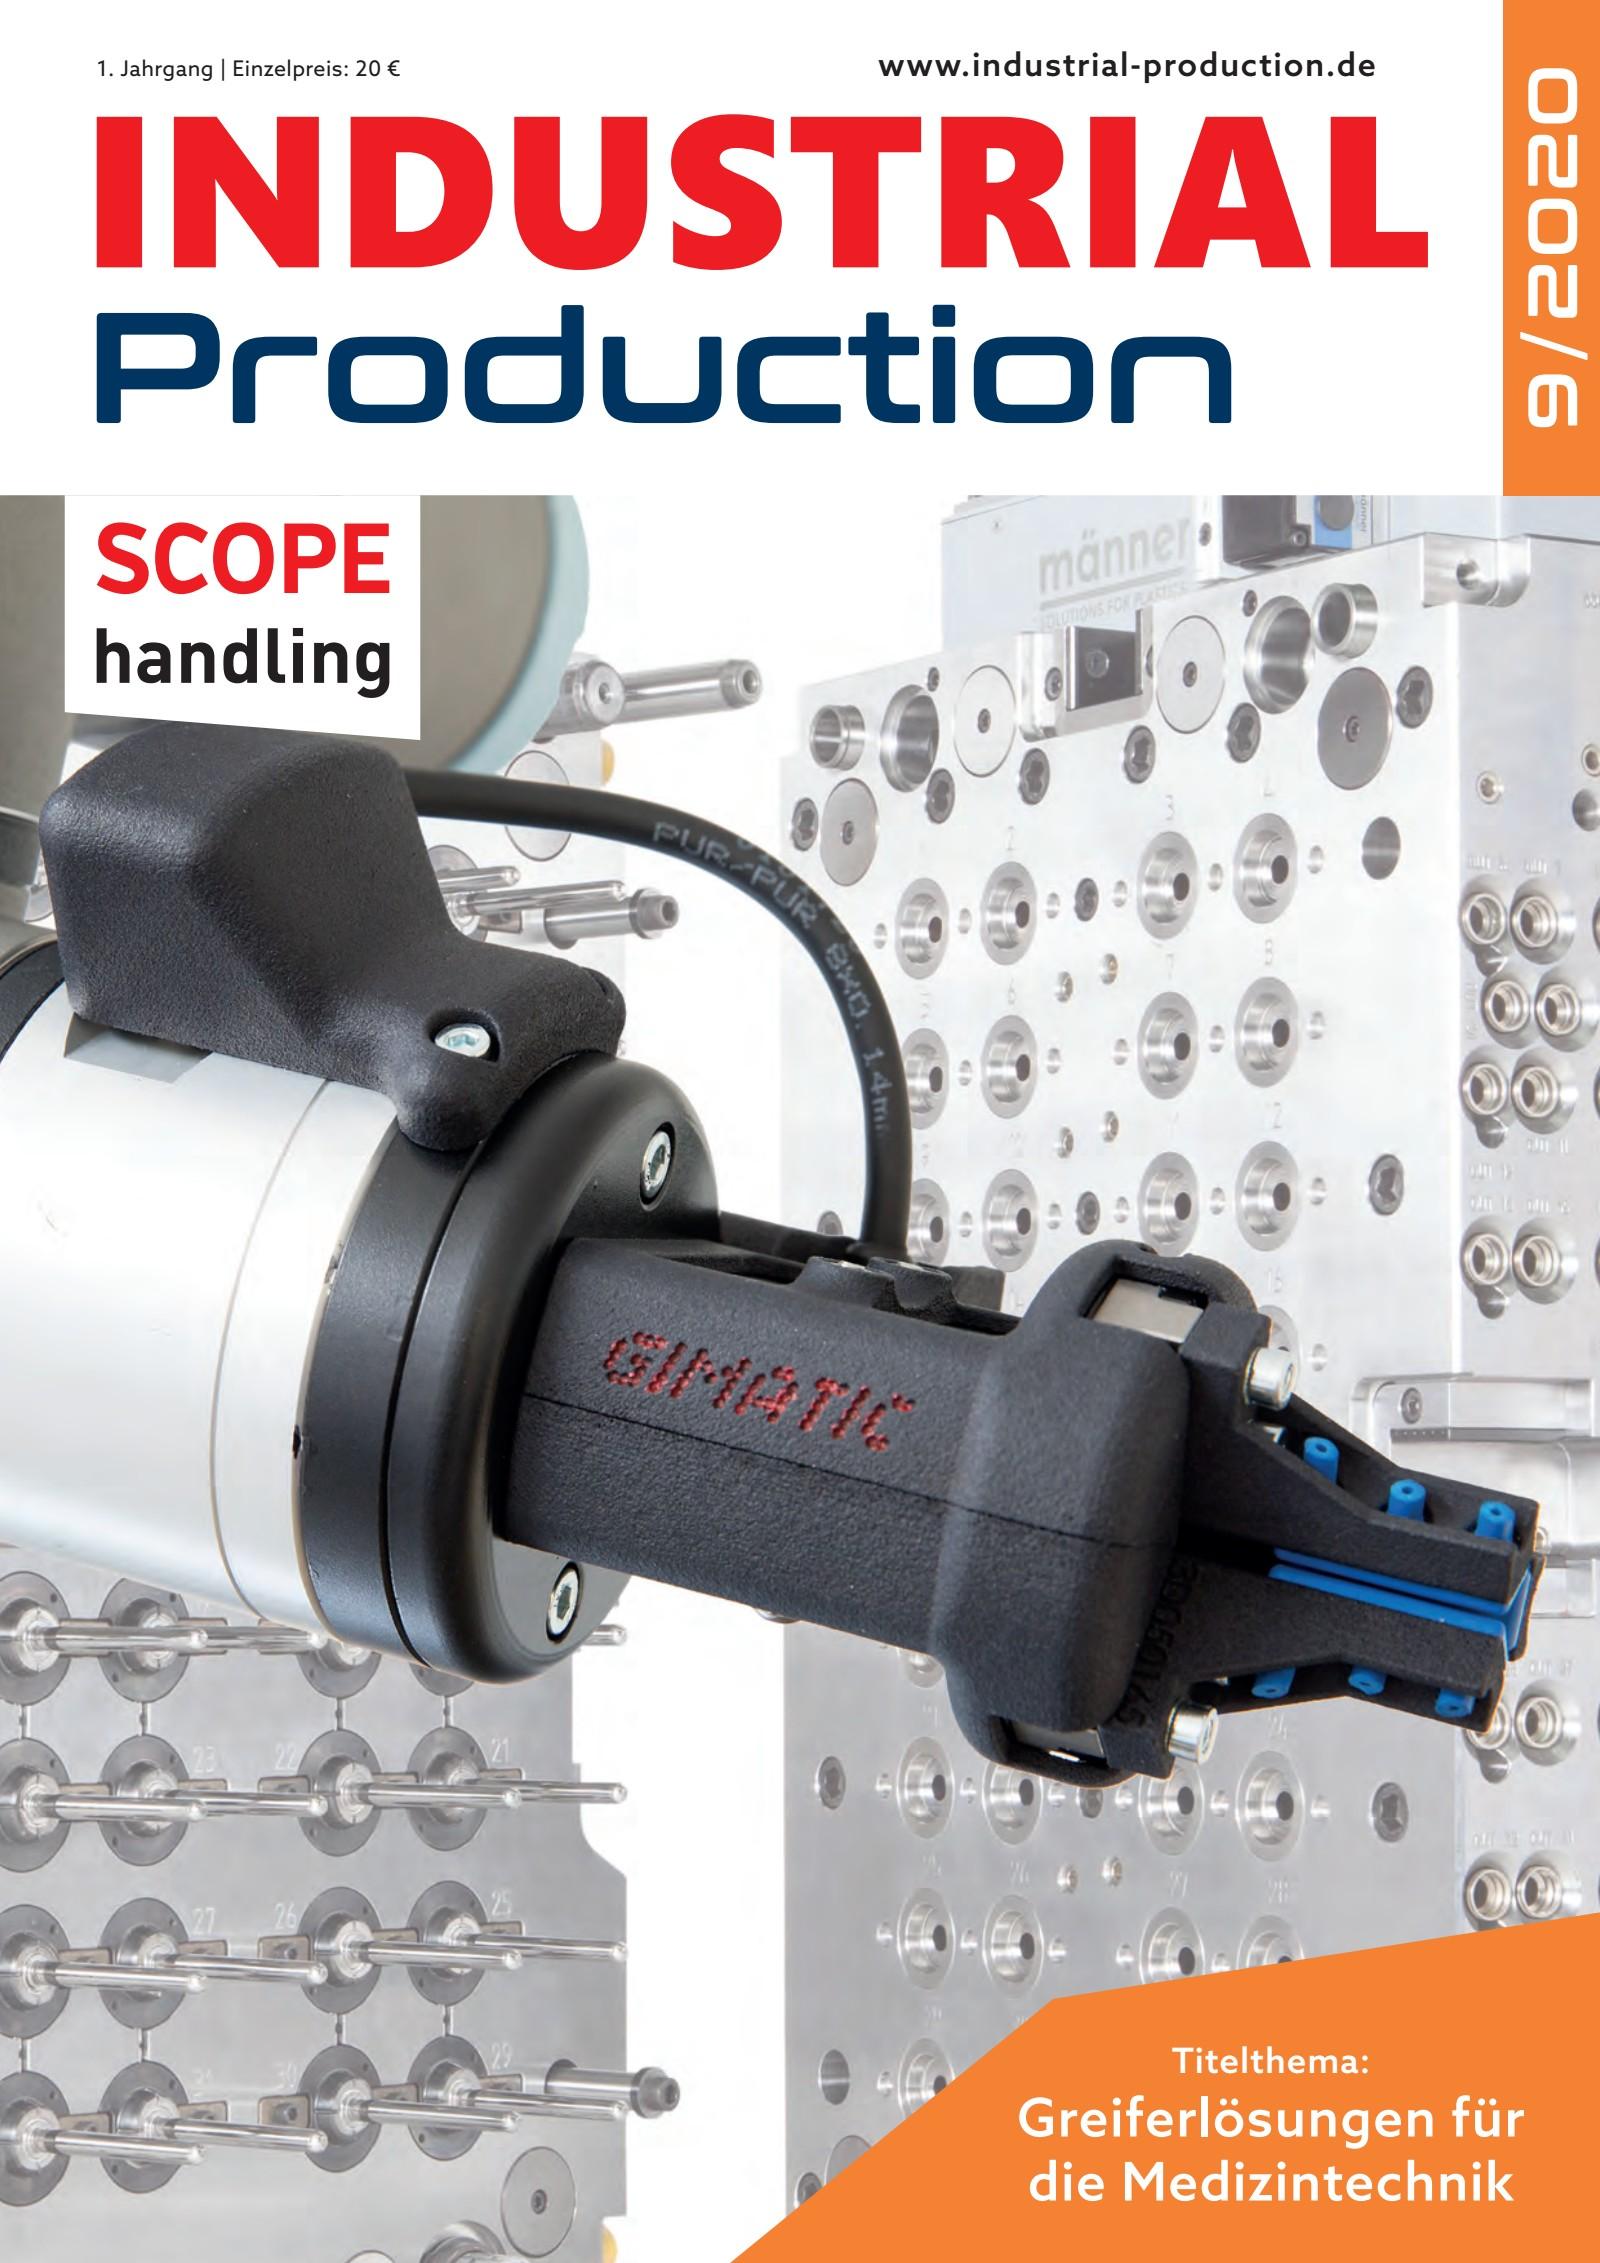 INDUSTRIAL Production 09/2020 Digital